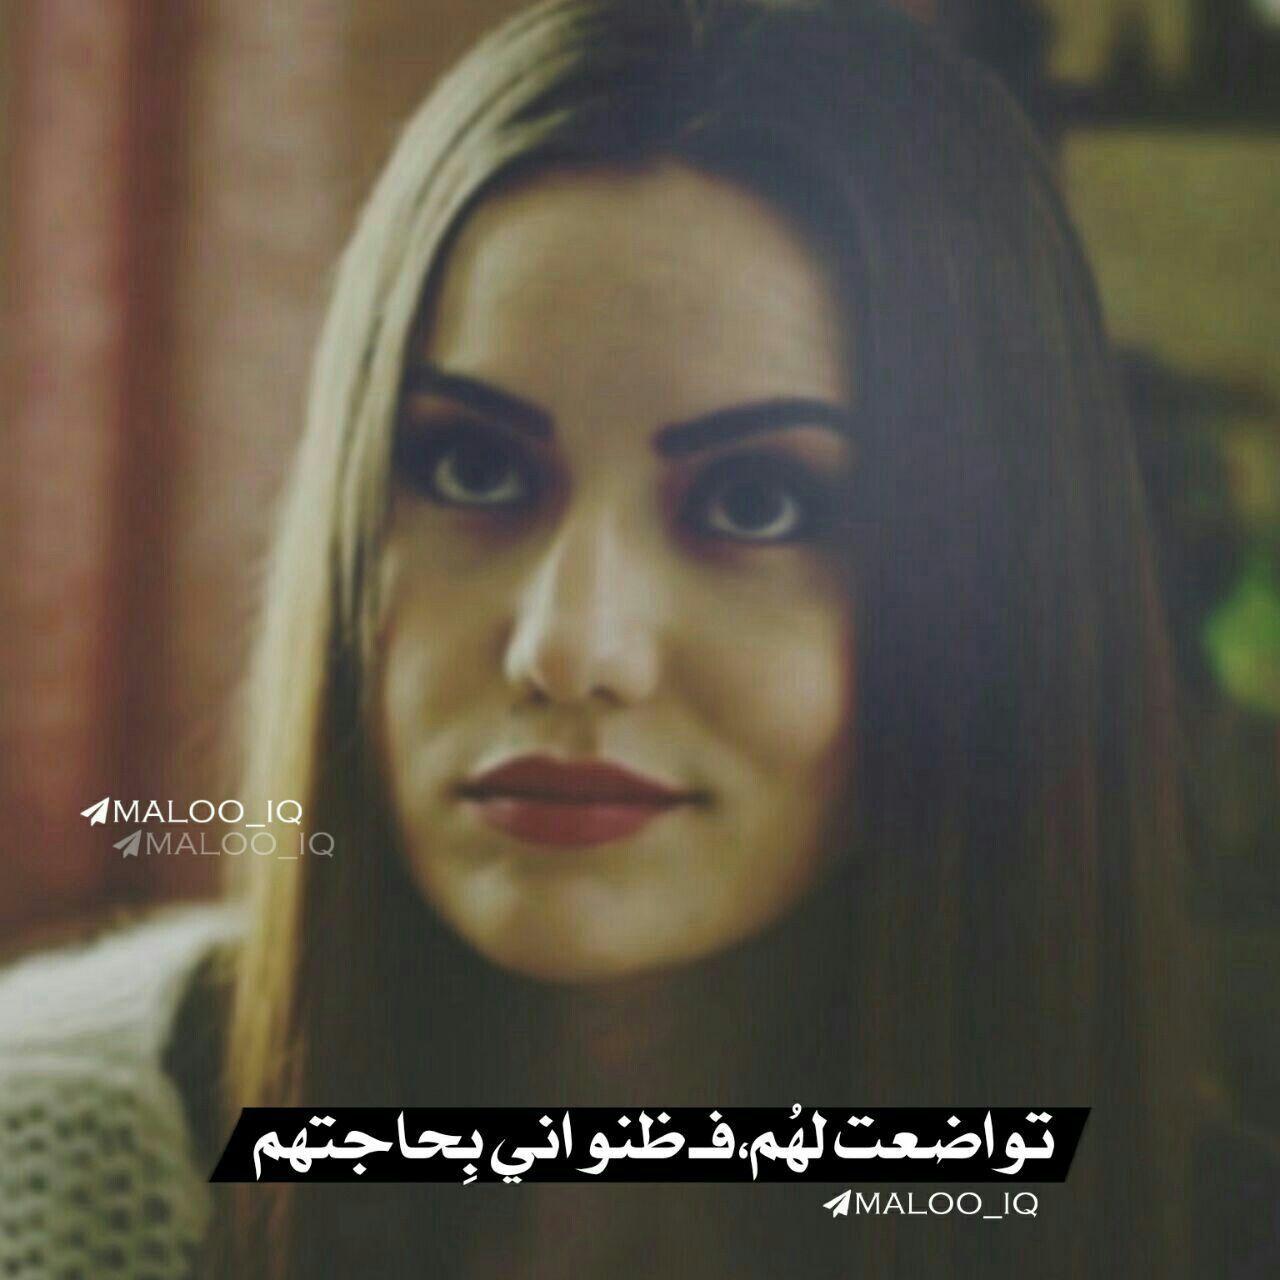 Mego انثي كبرياء كرامة تواضع انستا تمبلر انستقرام بنات صور Romantic Words Arabic Quotes Cute Love Couple